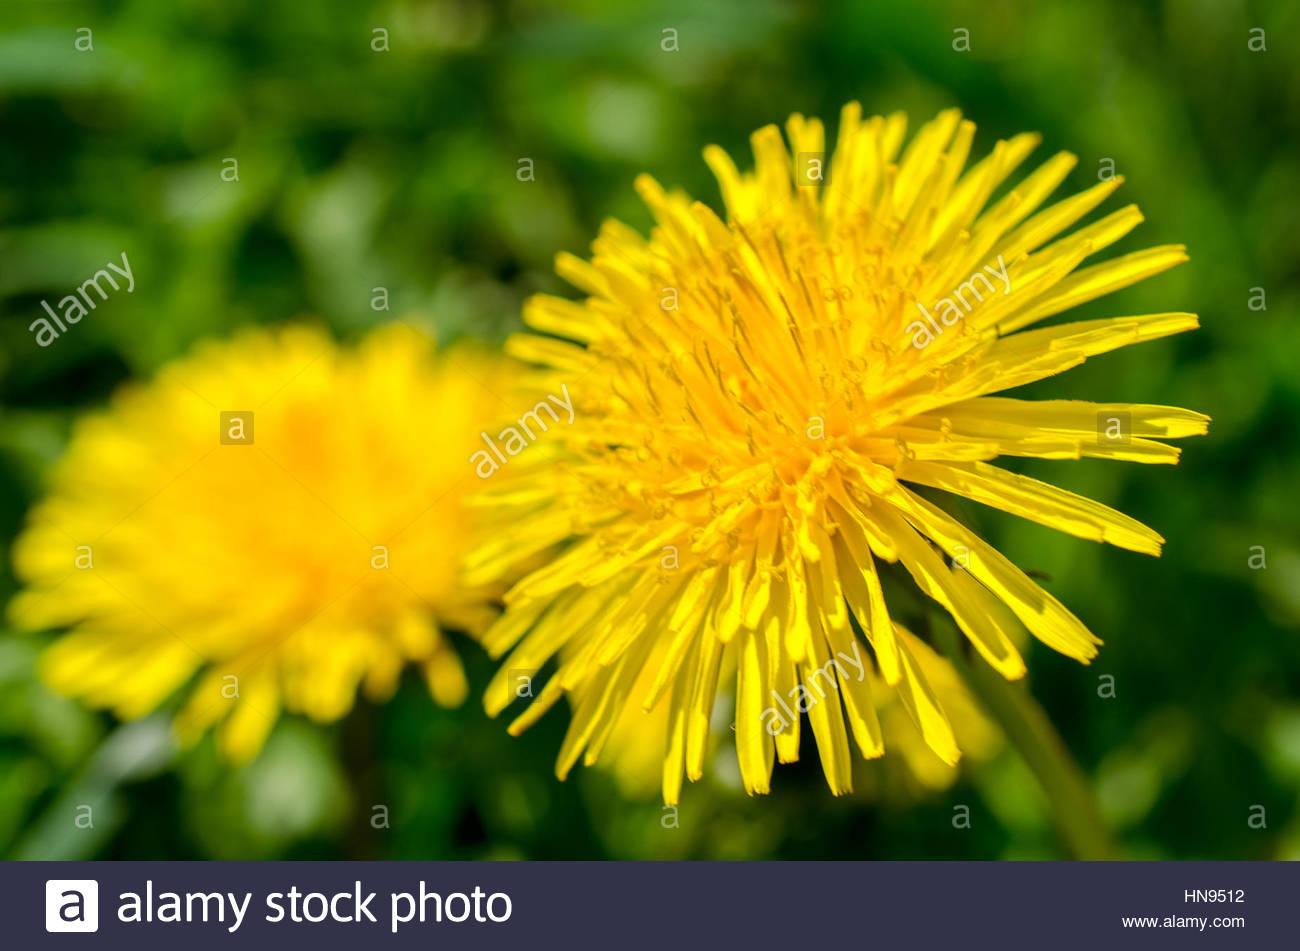 bright yellow spring flowers dandelions - Stock Image